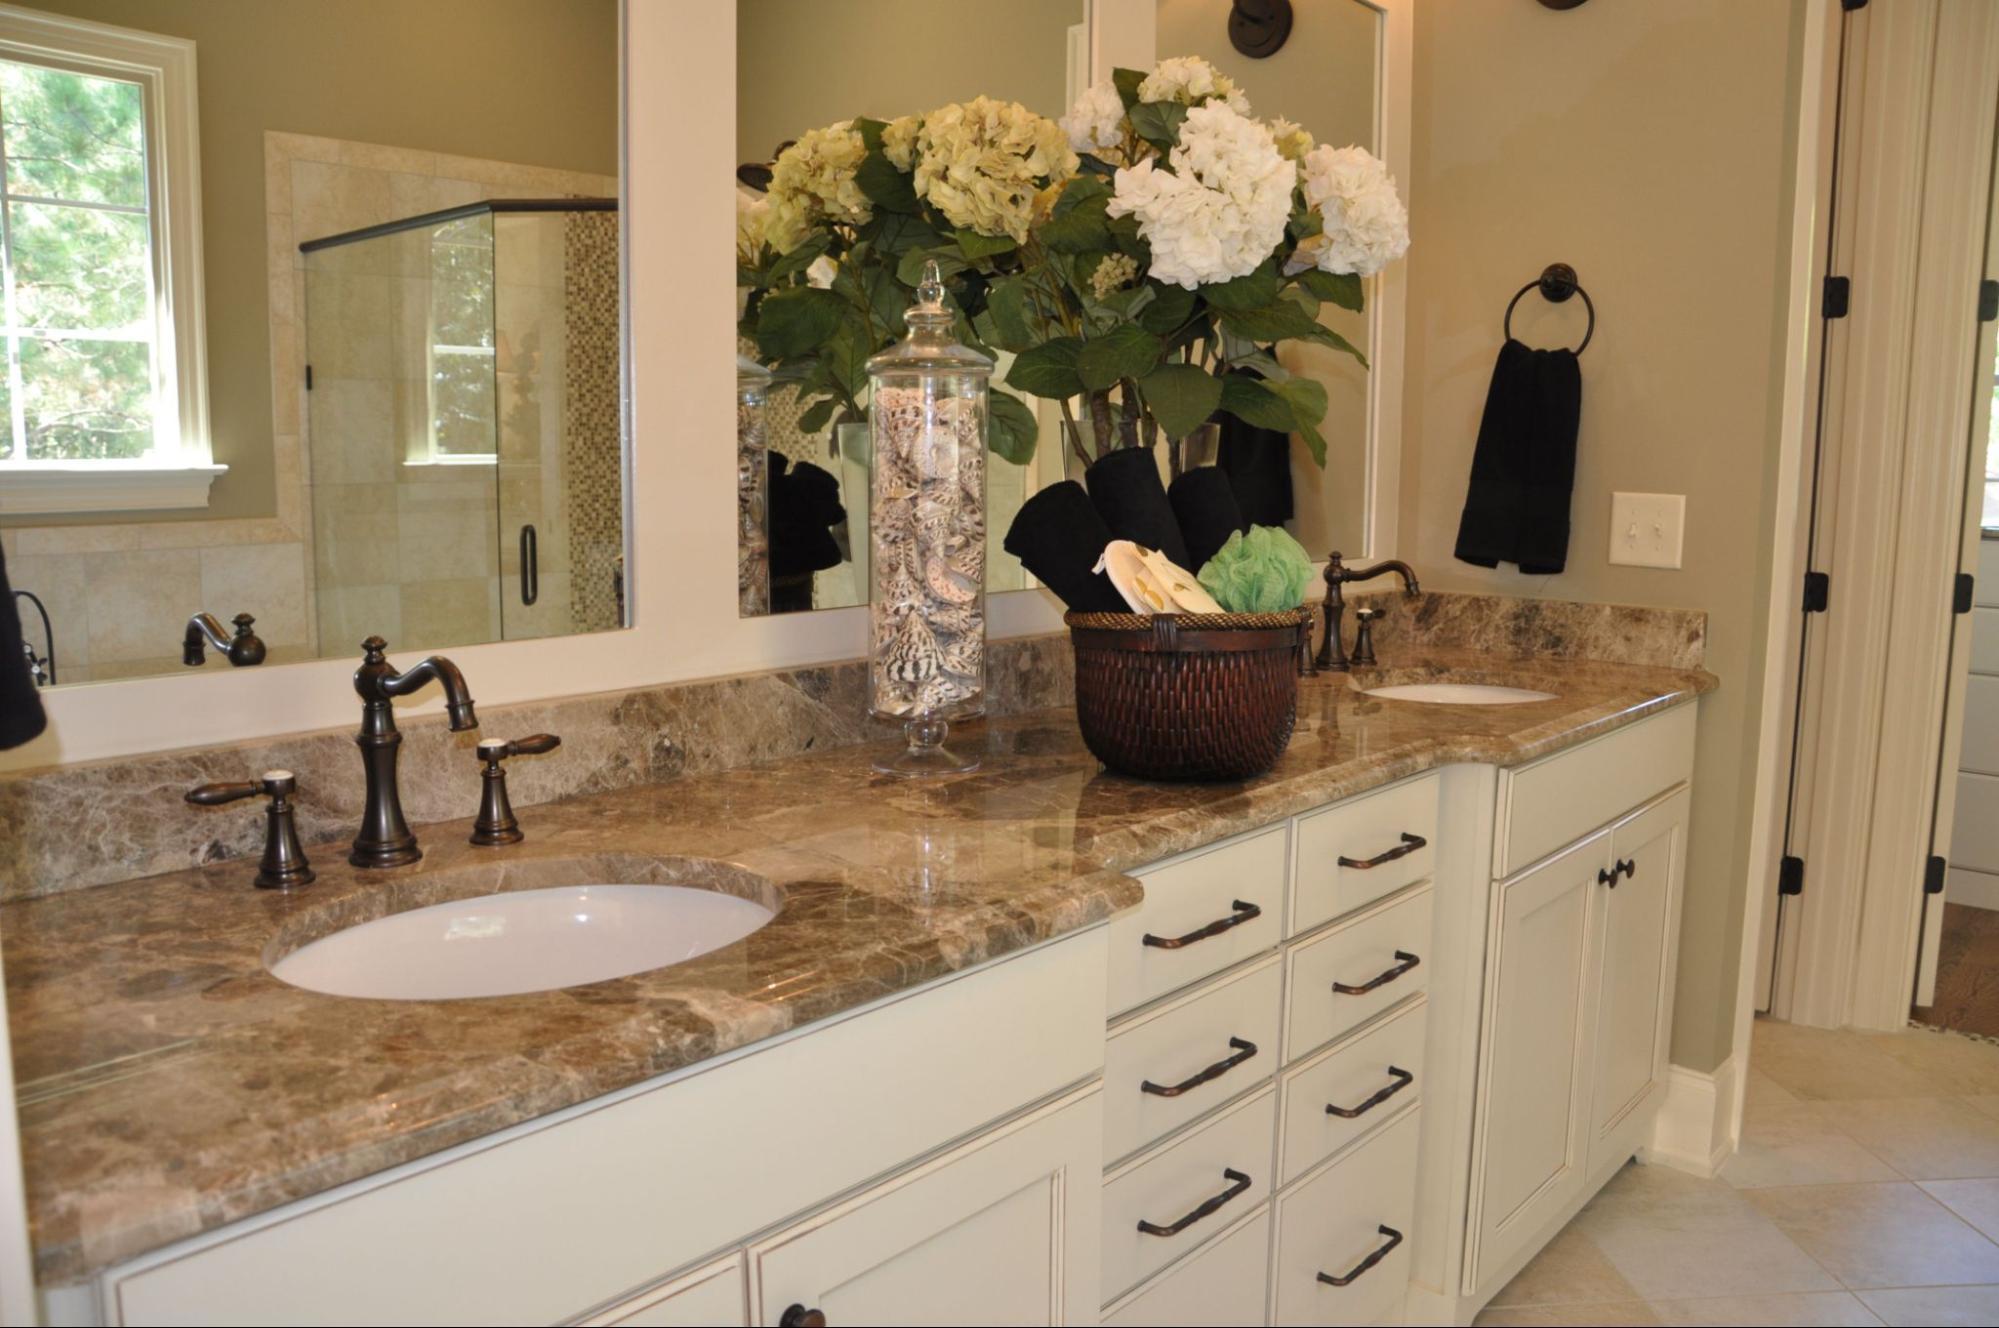 Breccia Marble Slab On Bathroom Vanity Top